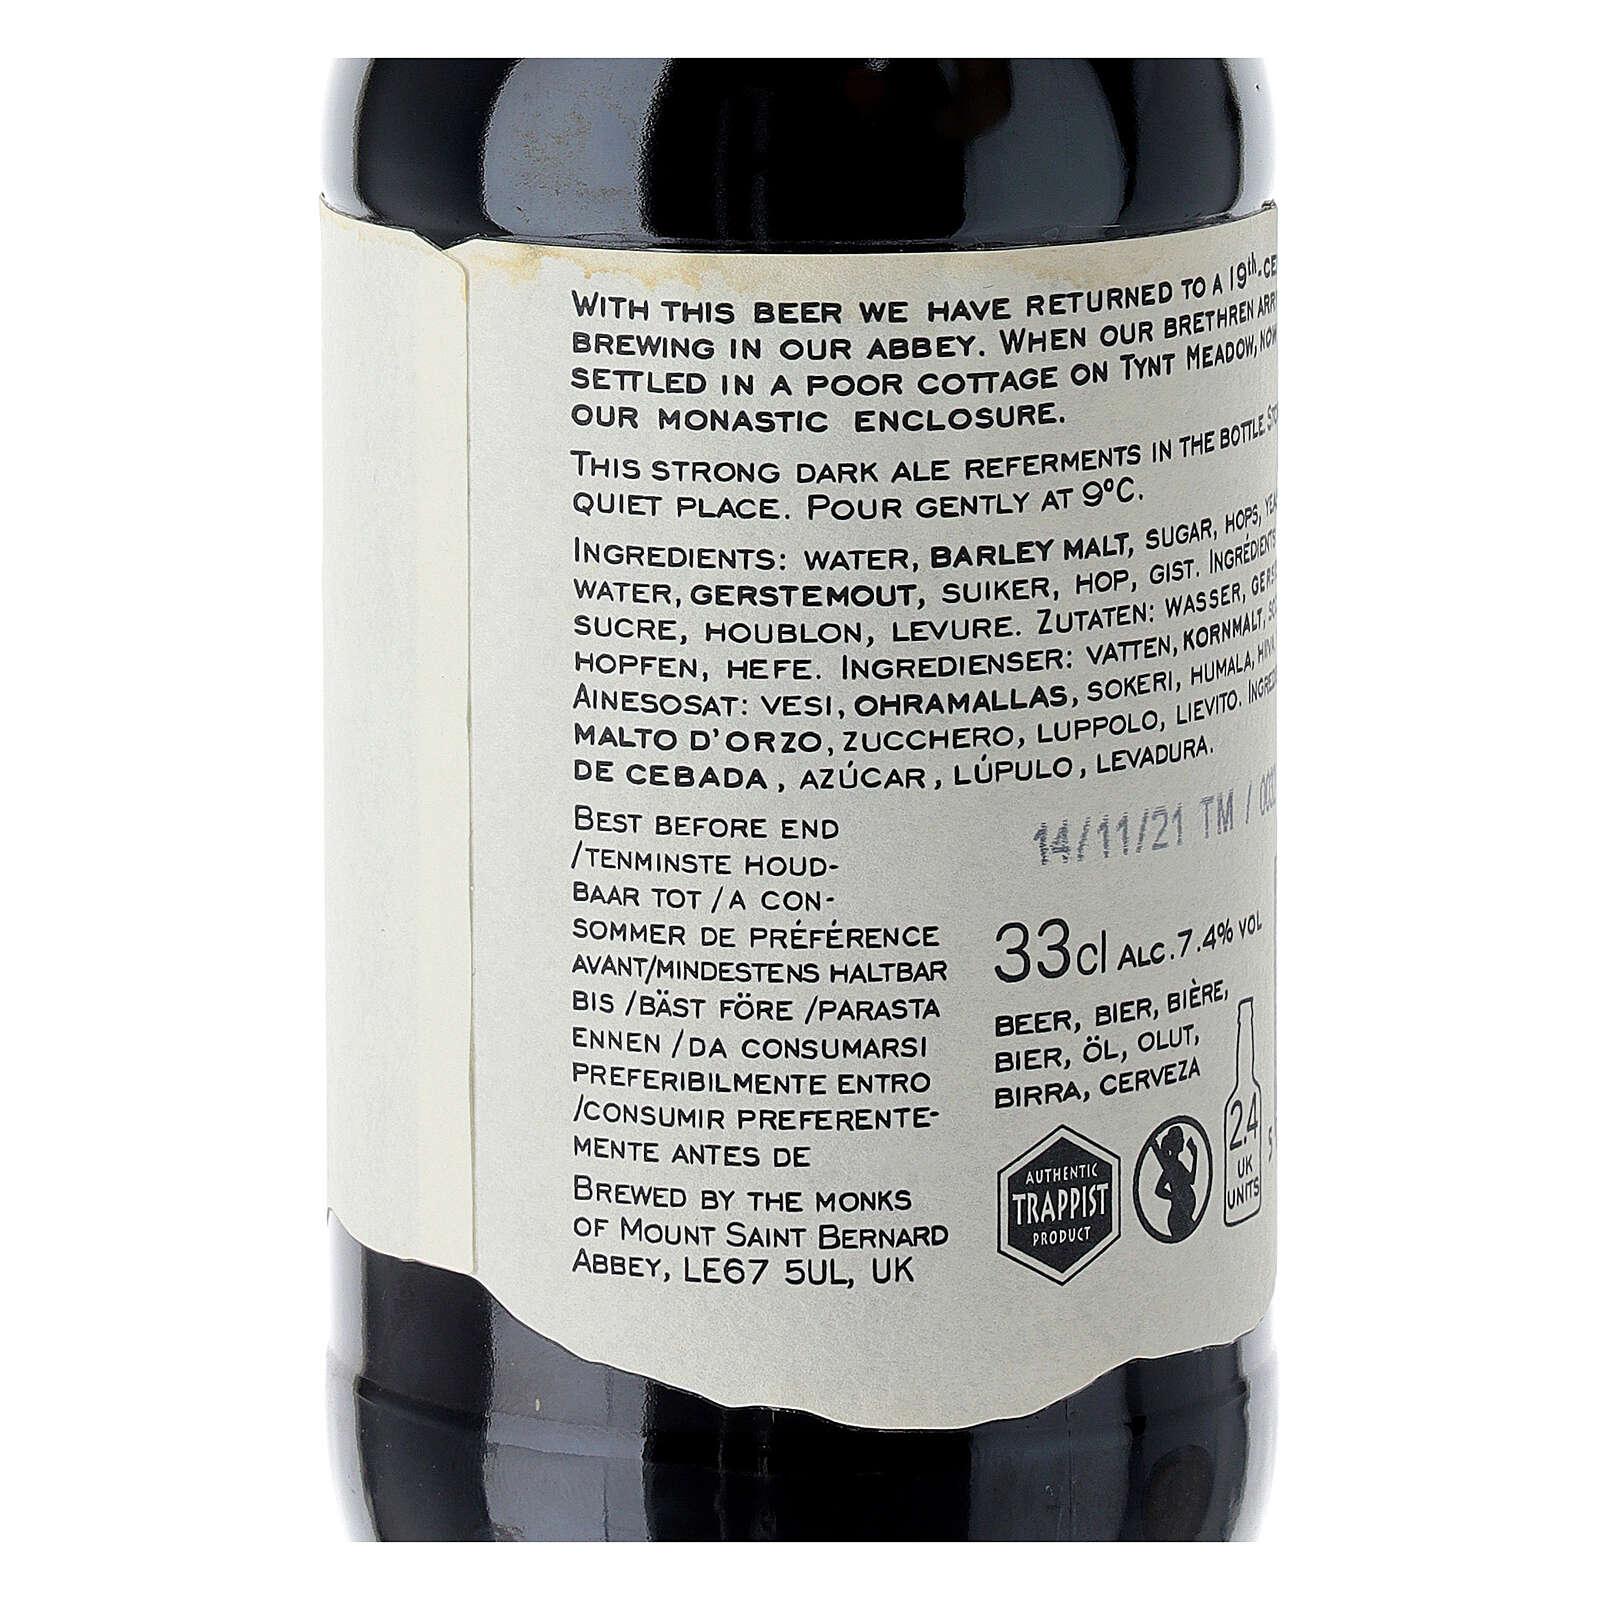 Bière brune Tynt Meadow Trappistes Anglais 33 cl 3